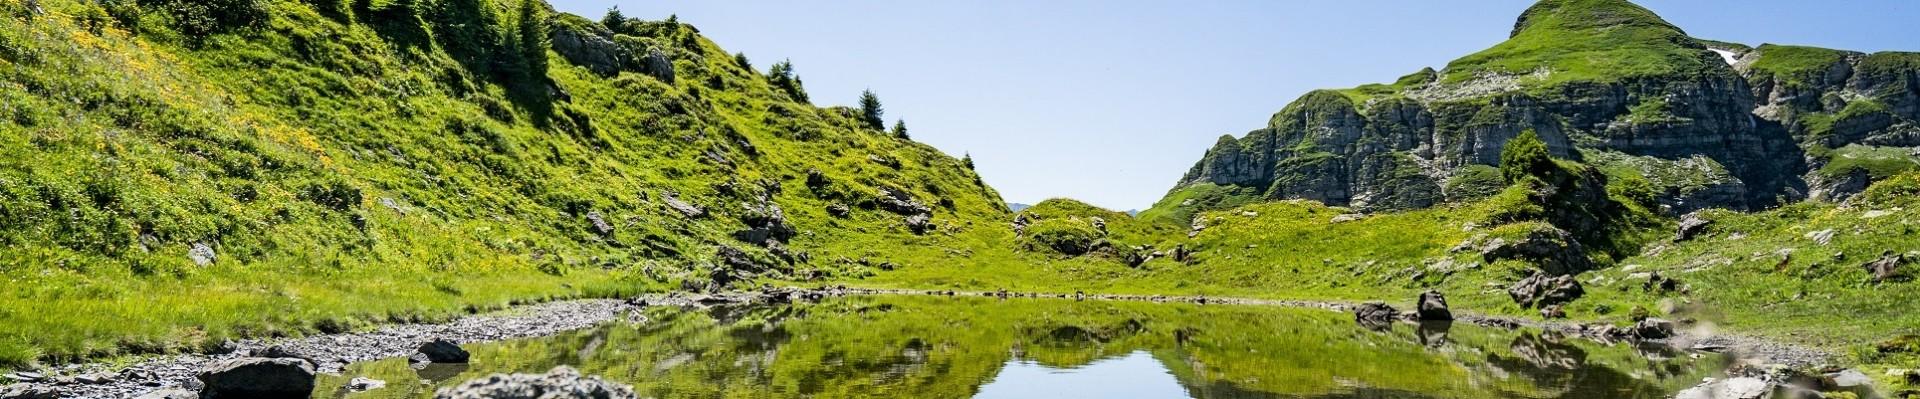 chatel in summer © lambert